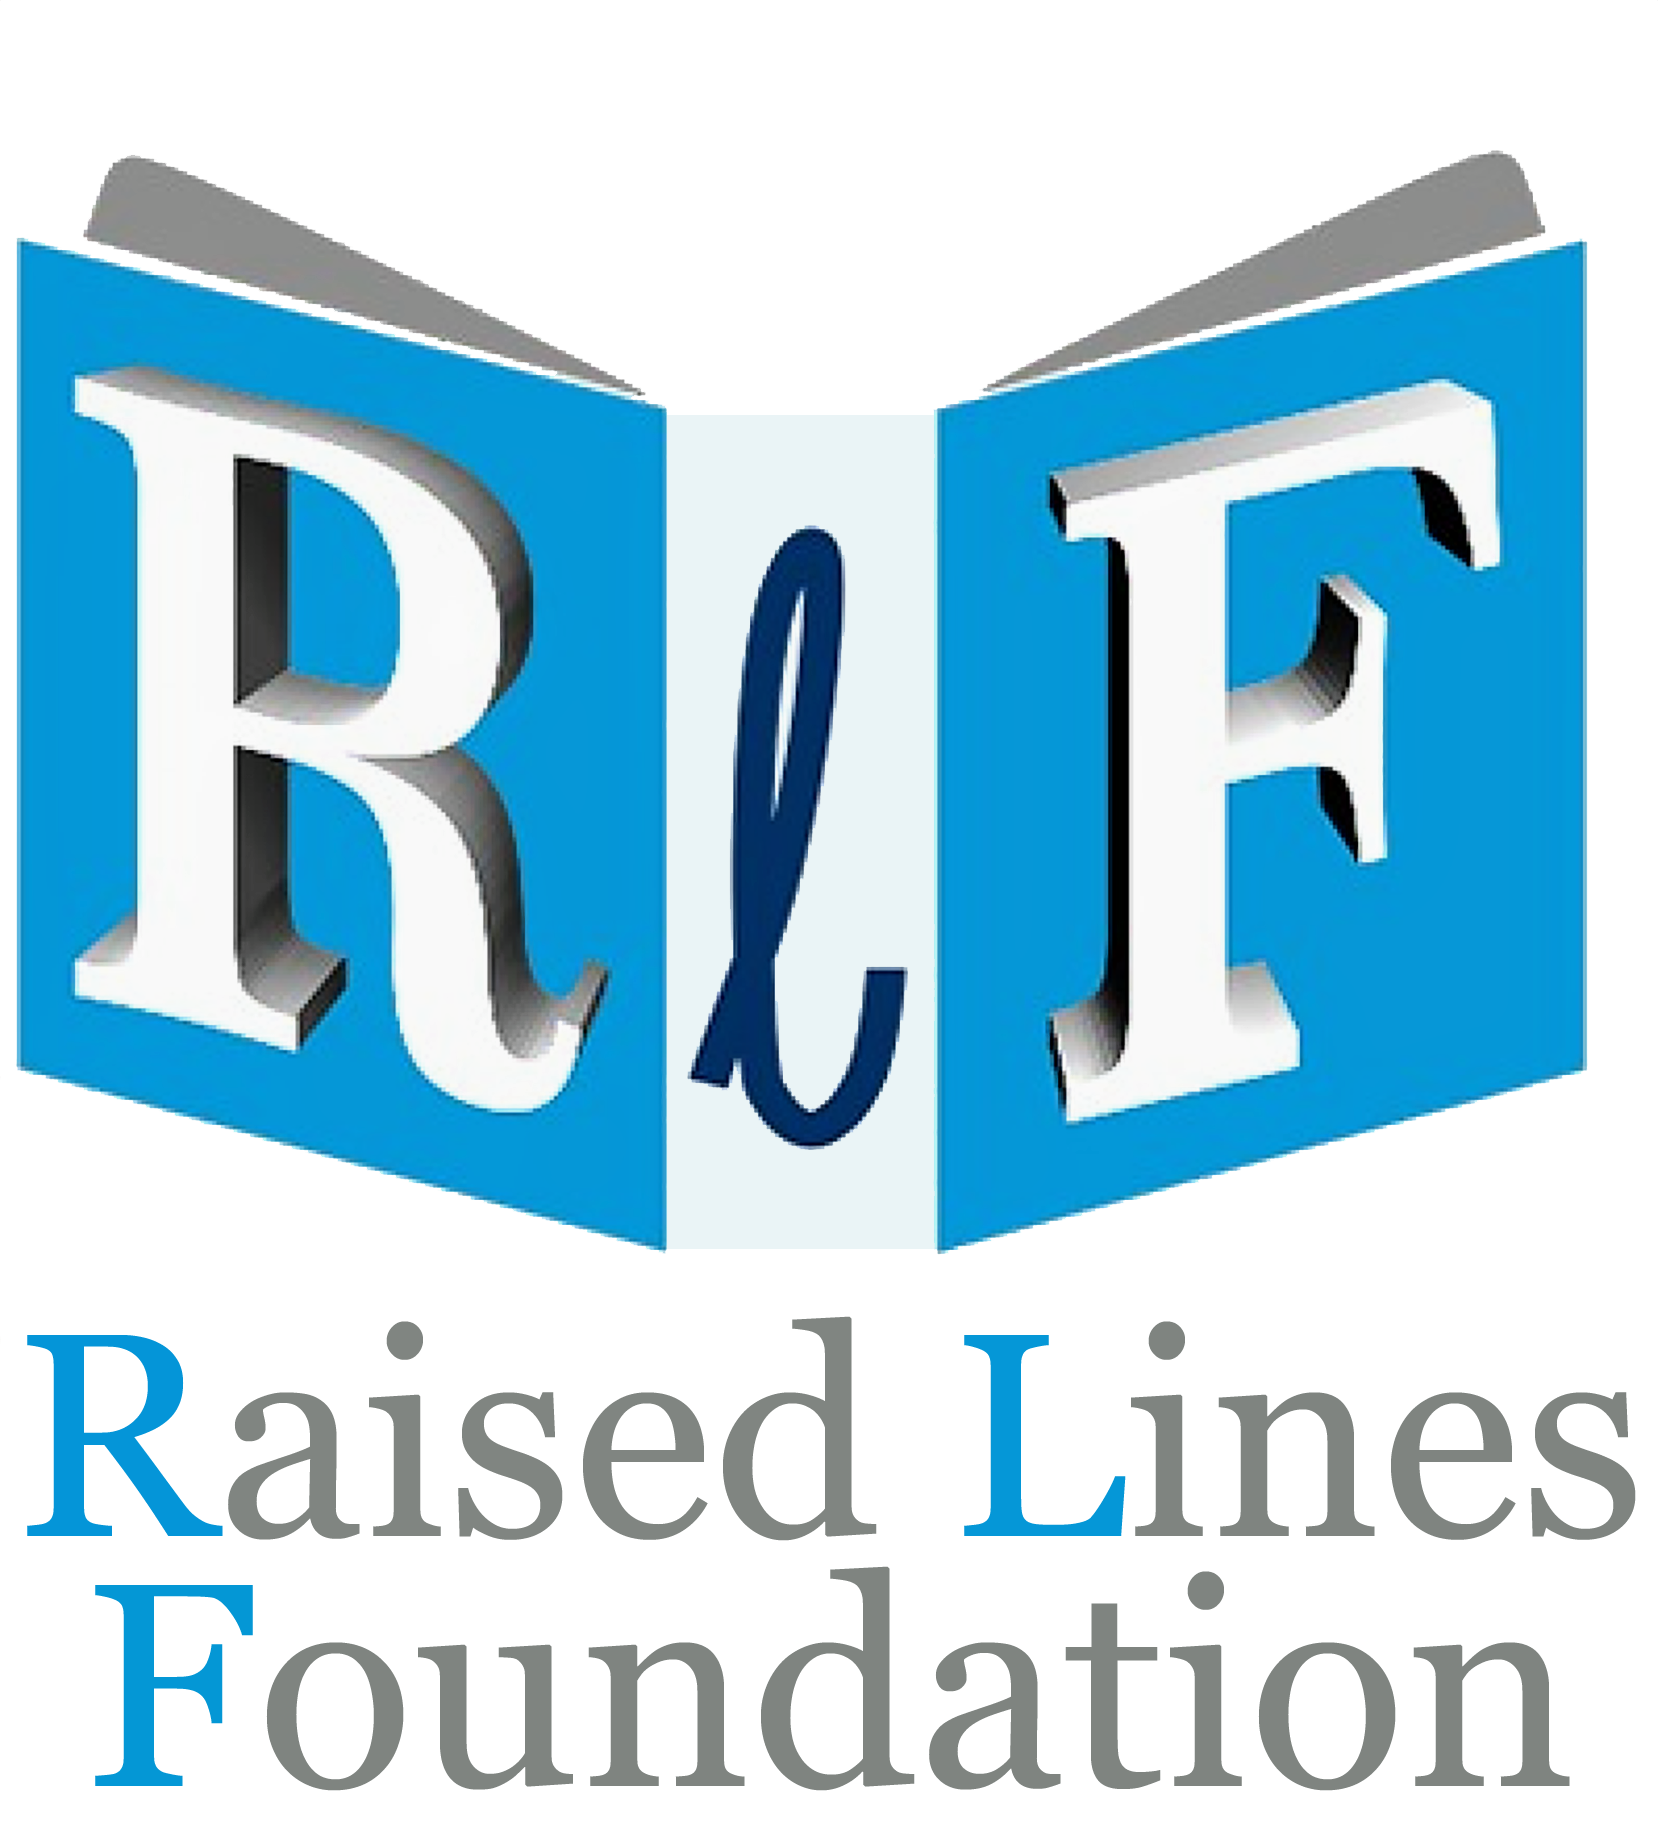 Raised Lines Foundation